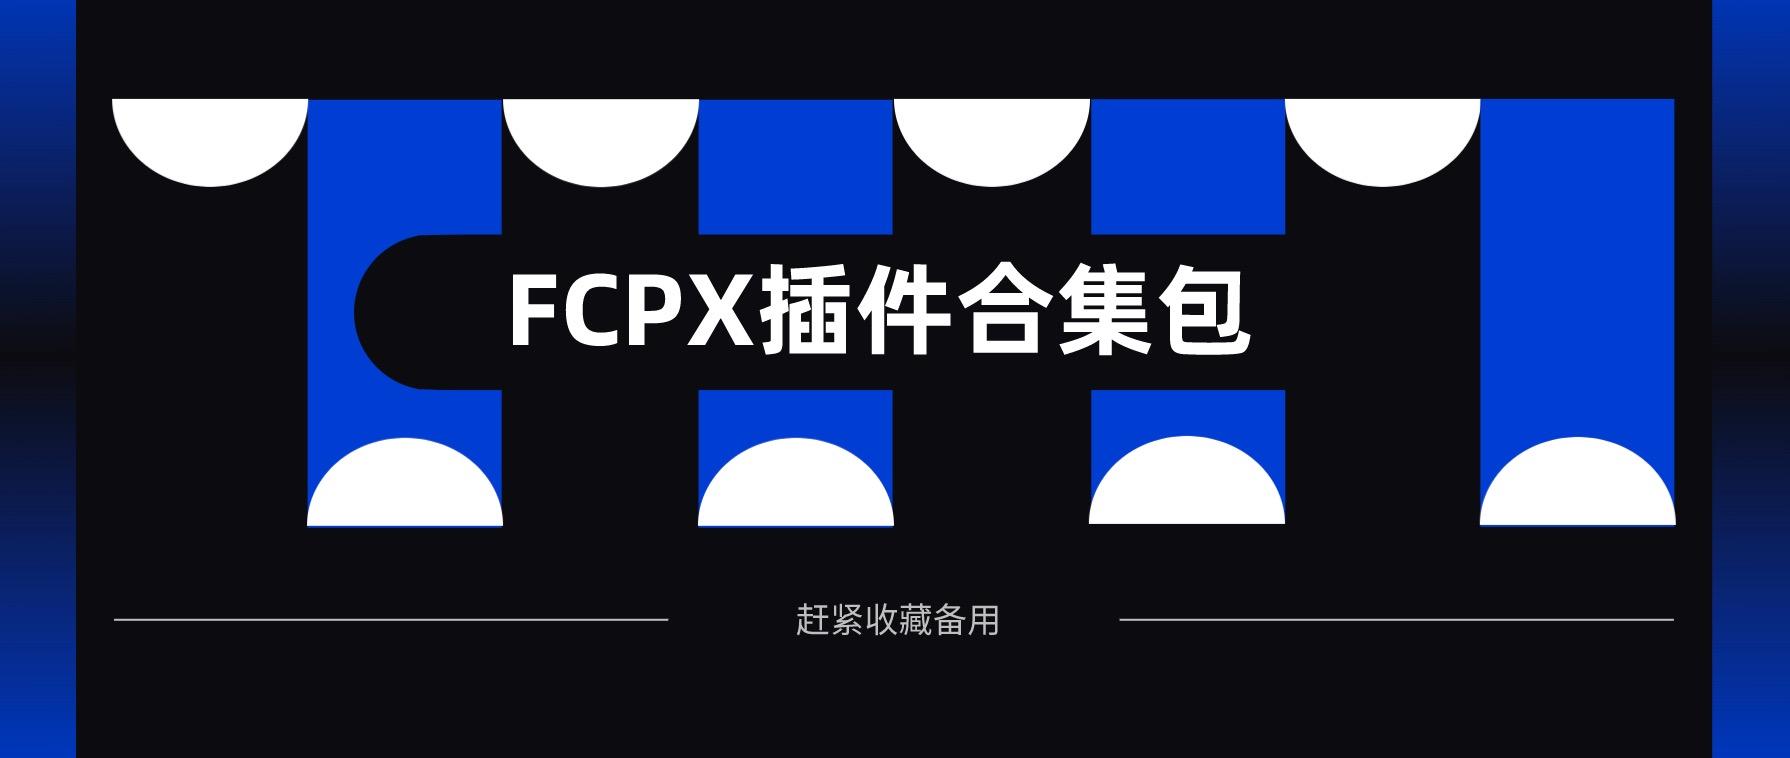 Final Cut Pro X(FCPX)优质插件合集包 百度网盘